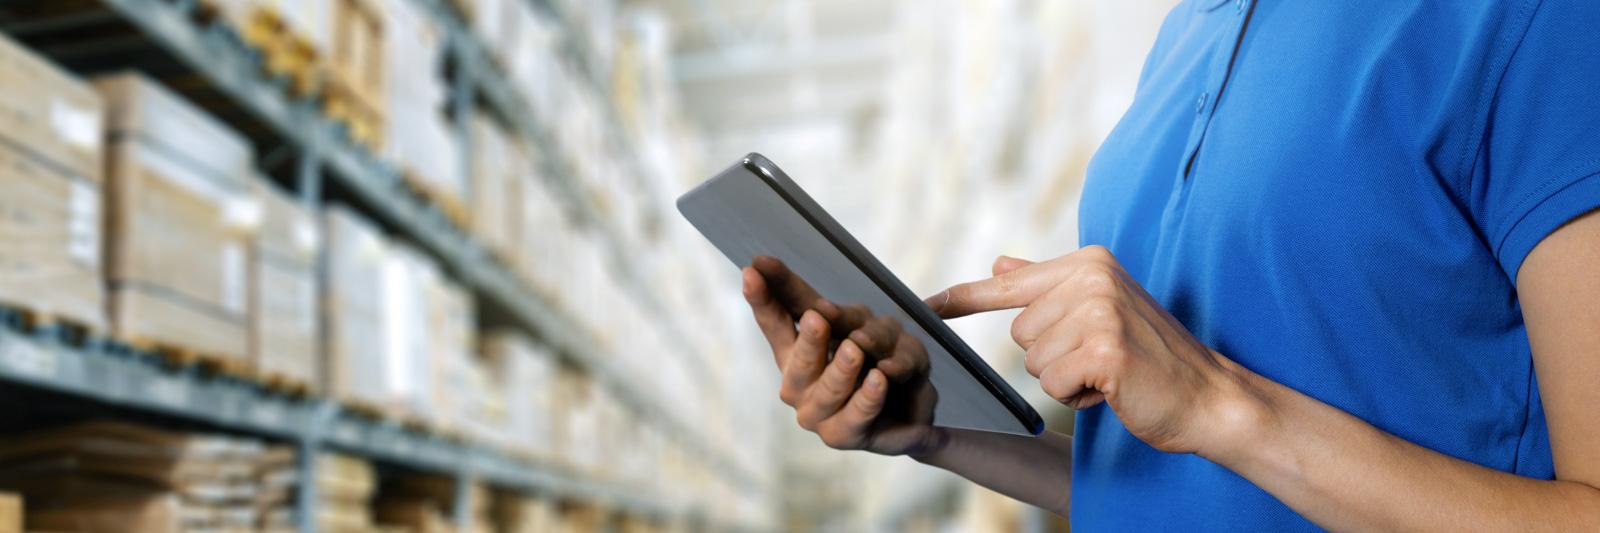 logistics service, warehouse management and inventory concept :: Foto © ronstik / Adobe Stock